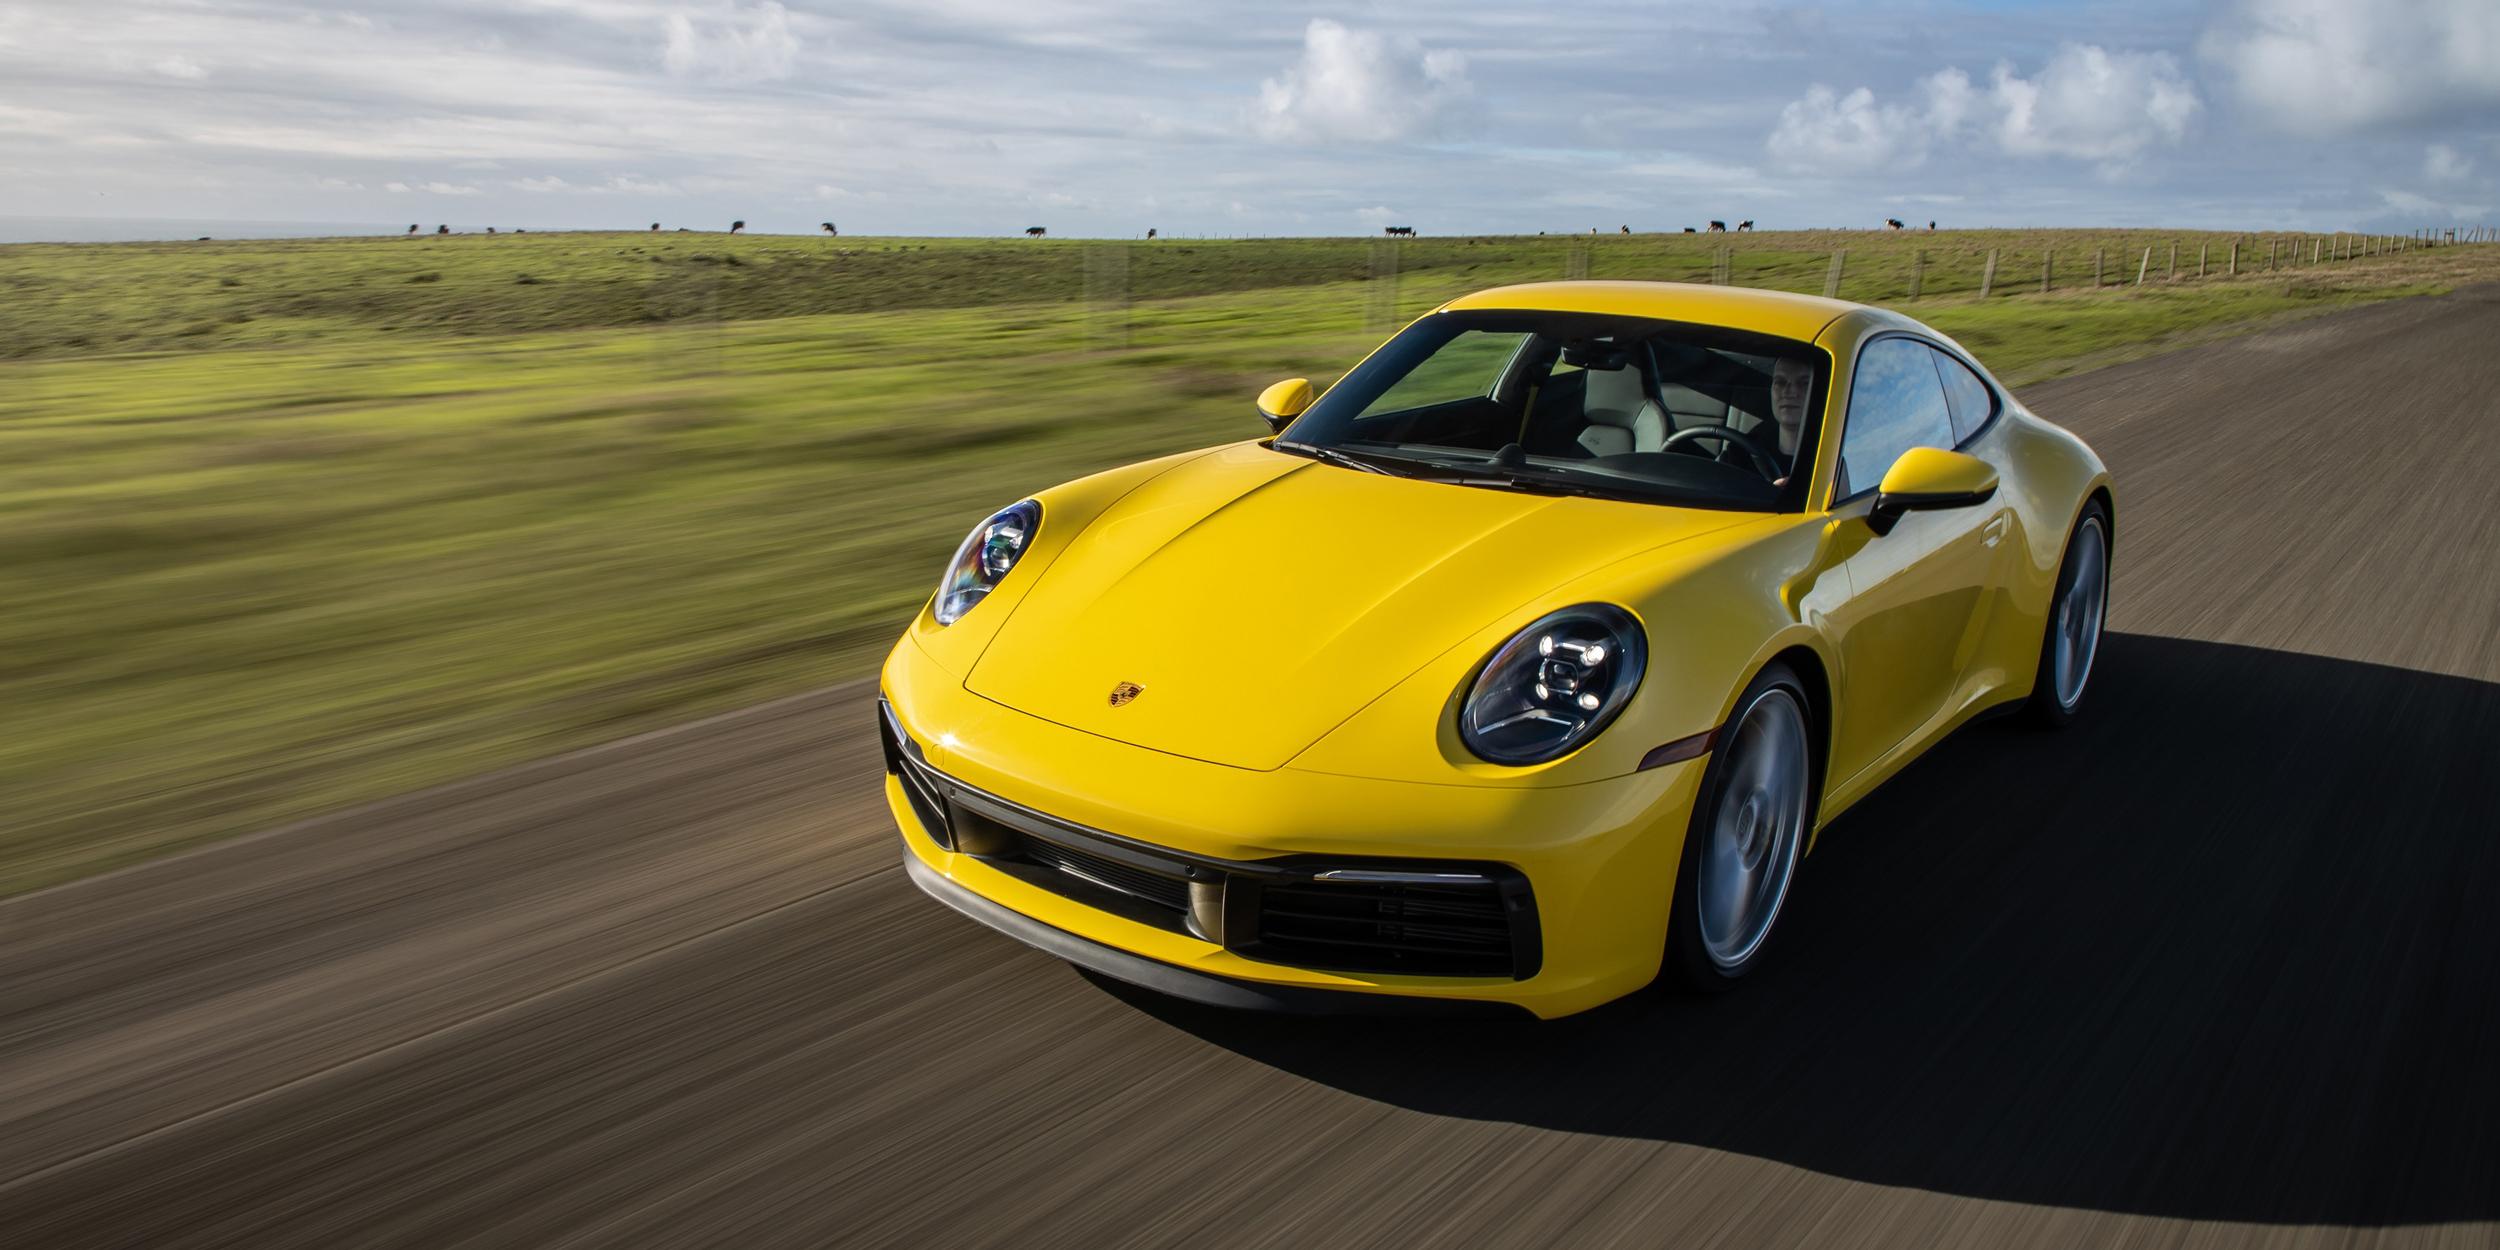 Porsche rankest highest on APEAL Rating